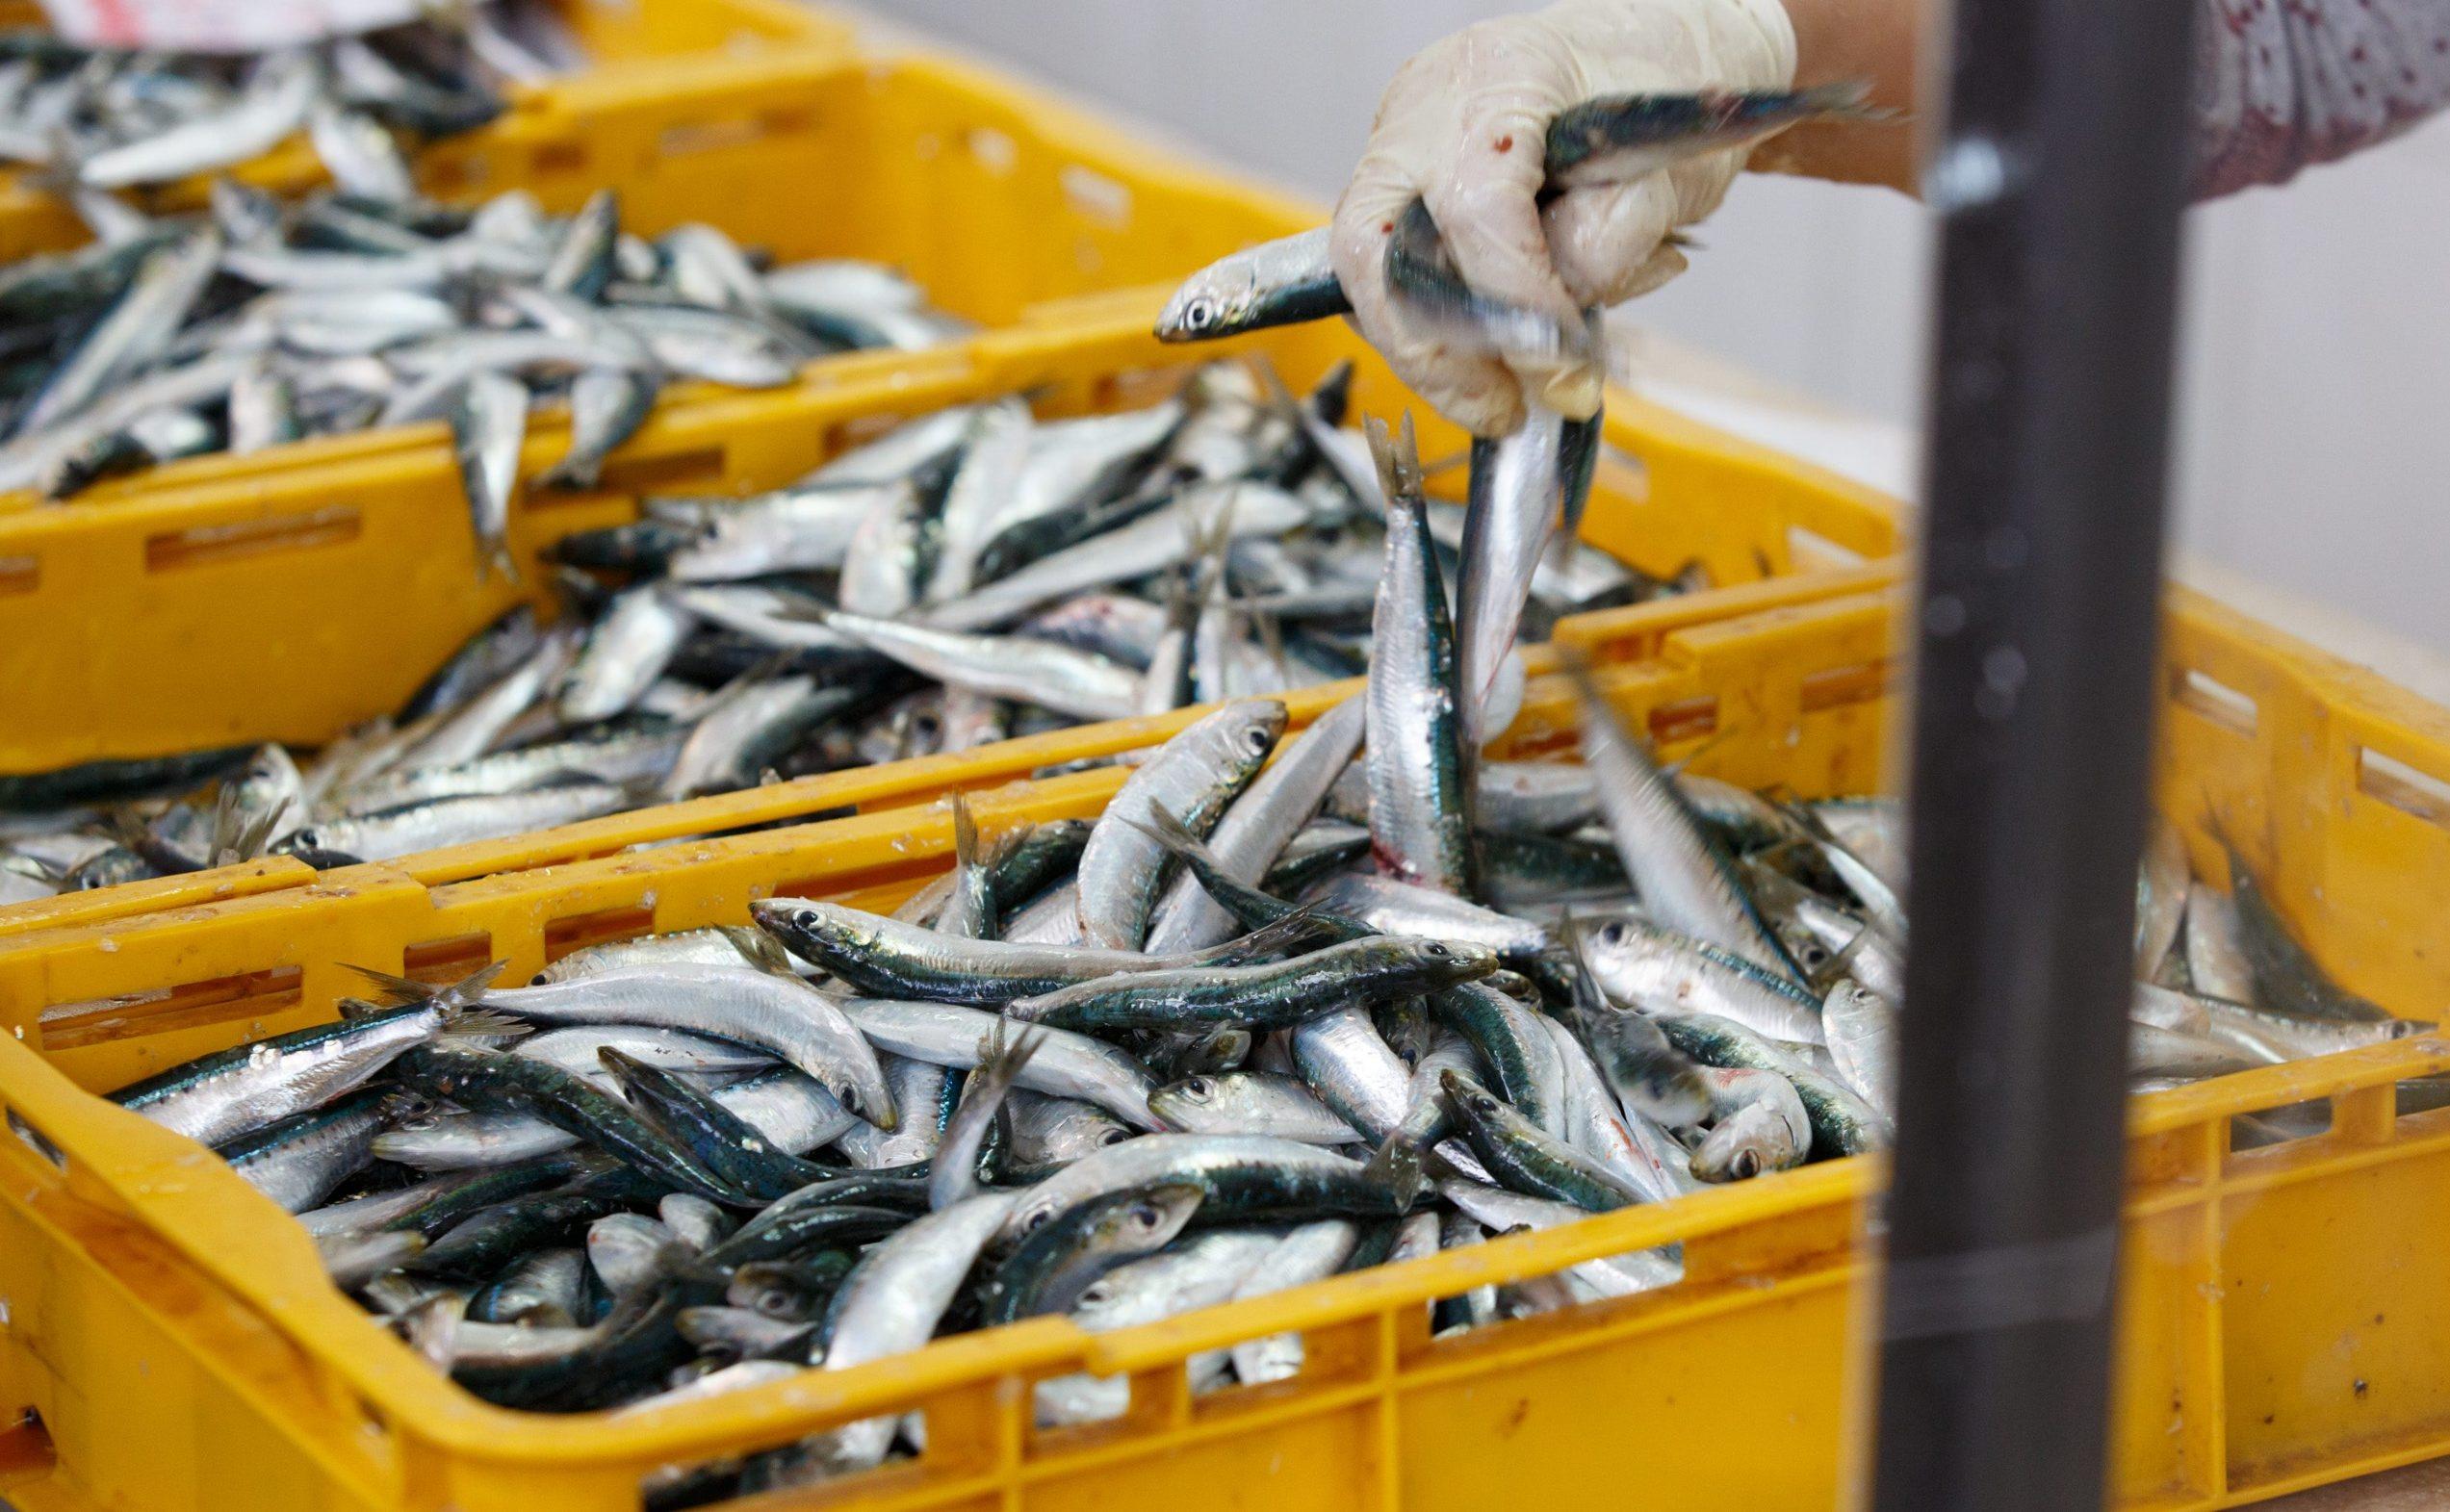 Split, 170420. Prodaja ribe na splitskoj ribarnici odvija se u skladu s preporukama epidemiologa. Ponuda nije obilna, ali nema ni previse kupaca. Foto: Jakov Prkic / CROPIX